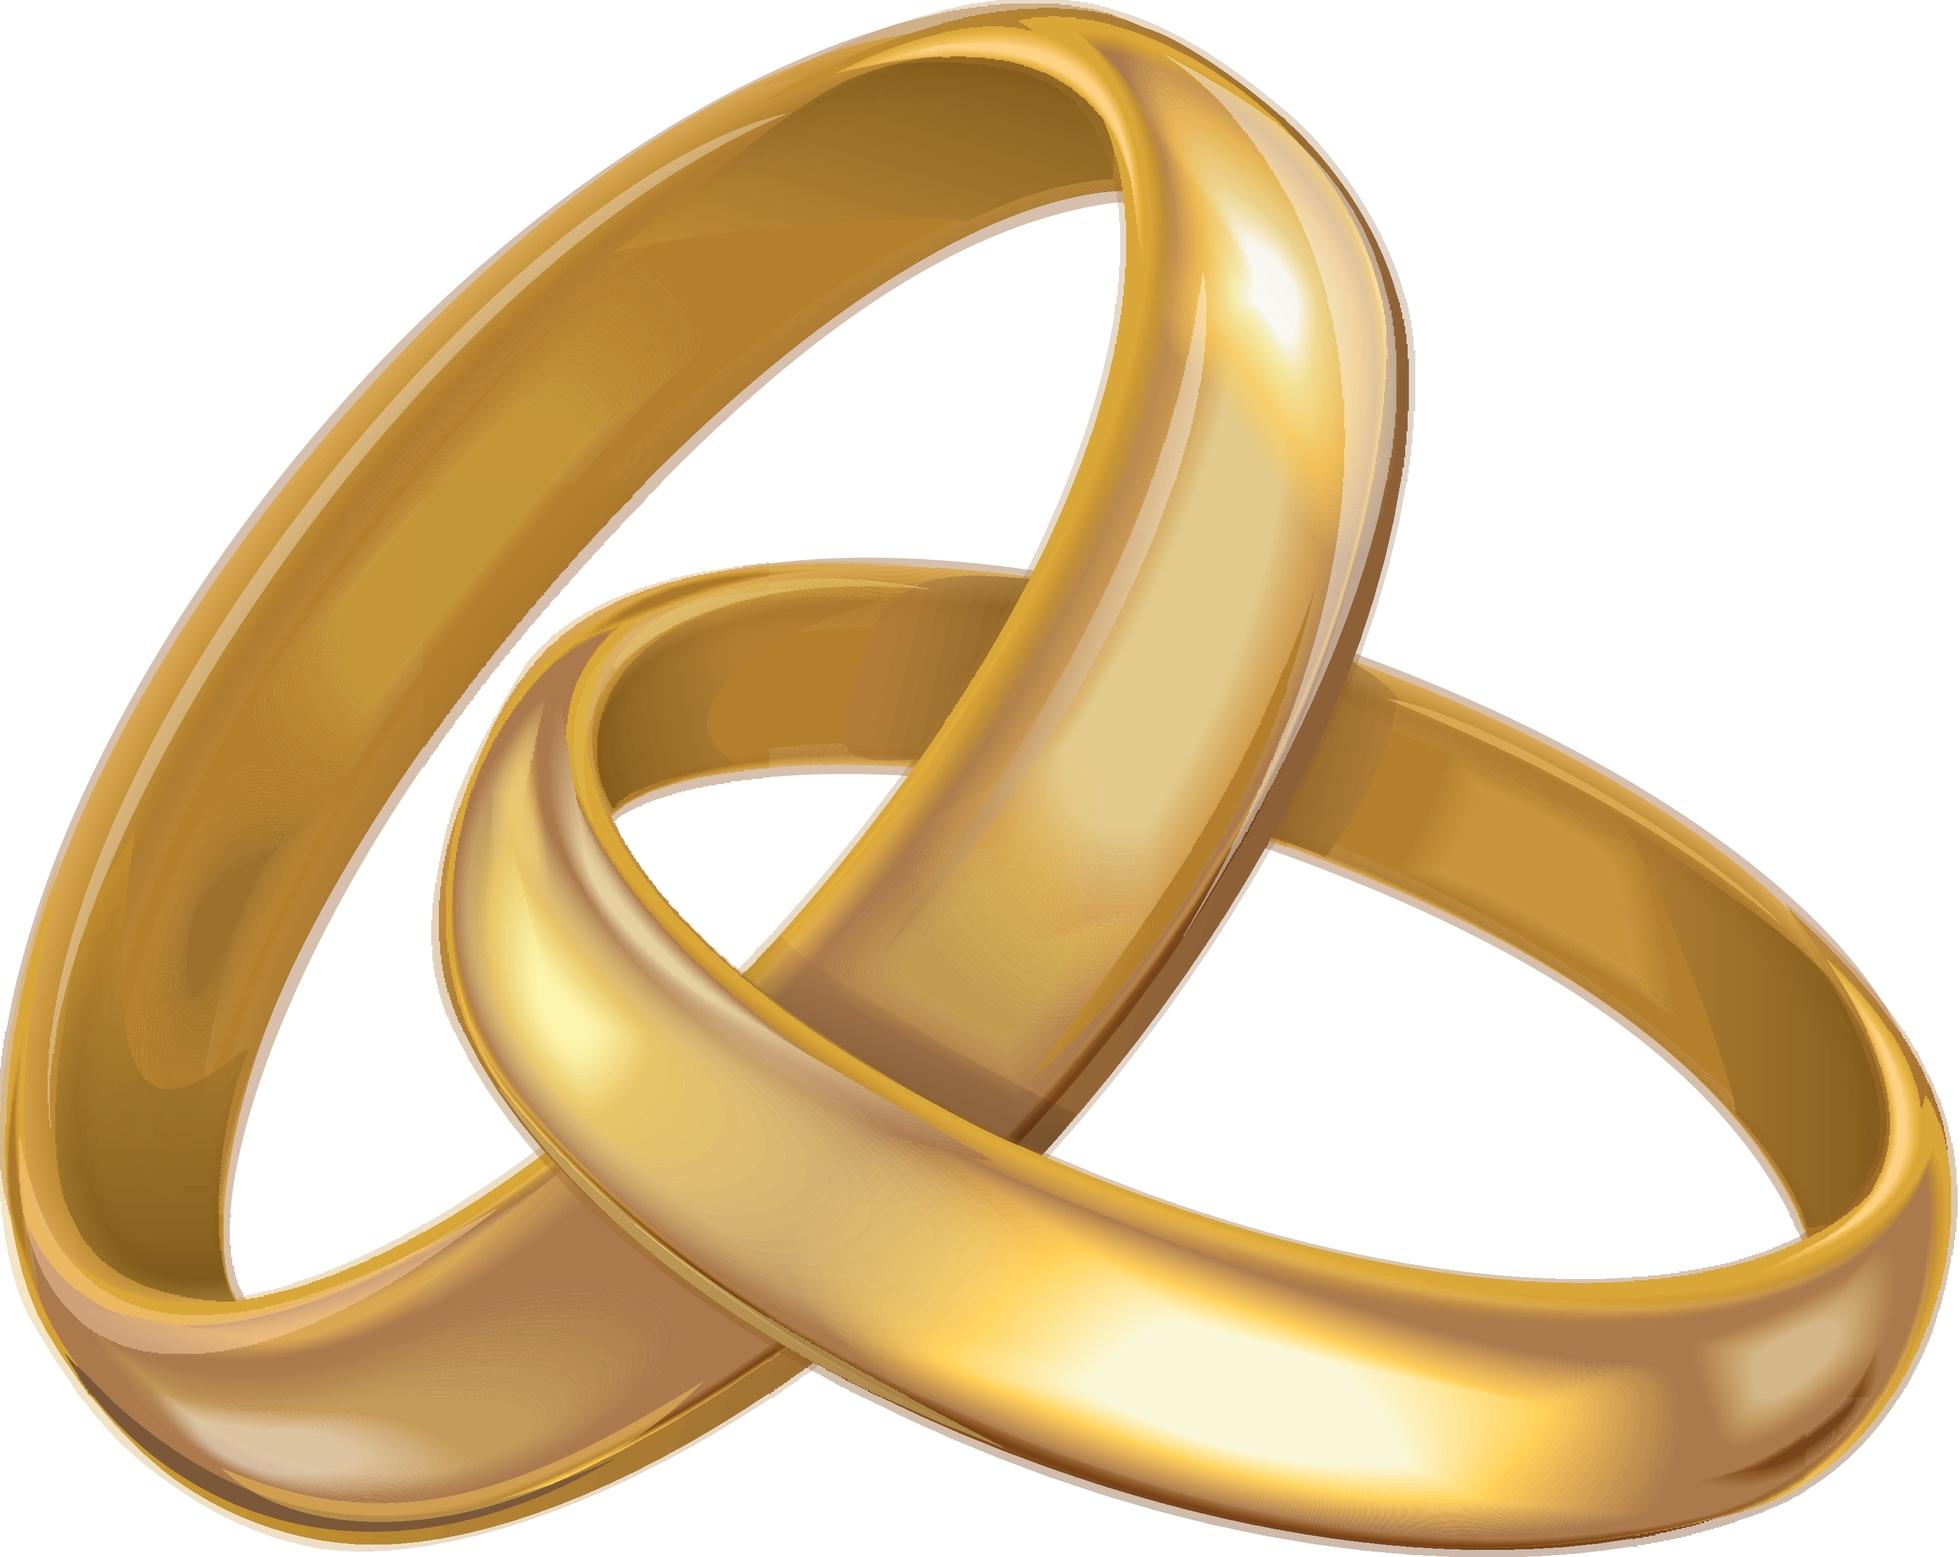 Wedding Ring Clipart | Wedding-Rings-Cli-wedding ring clipart | Wedding-Rings-Clipart[1]-11